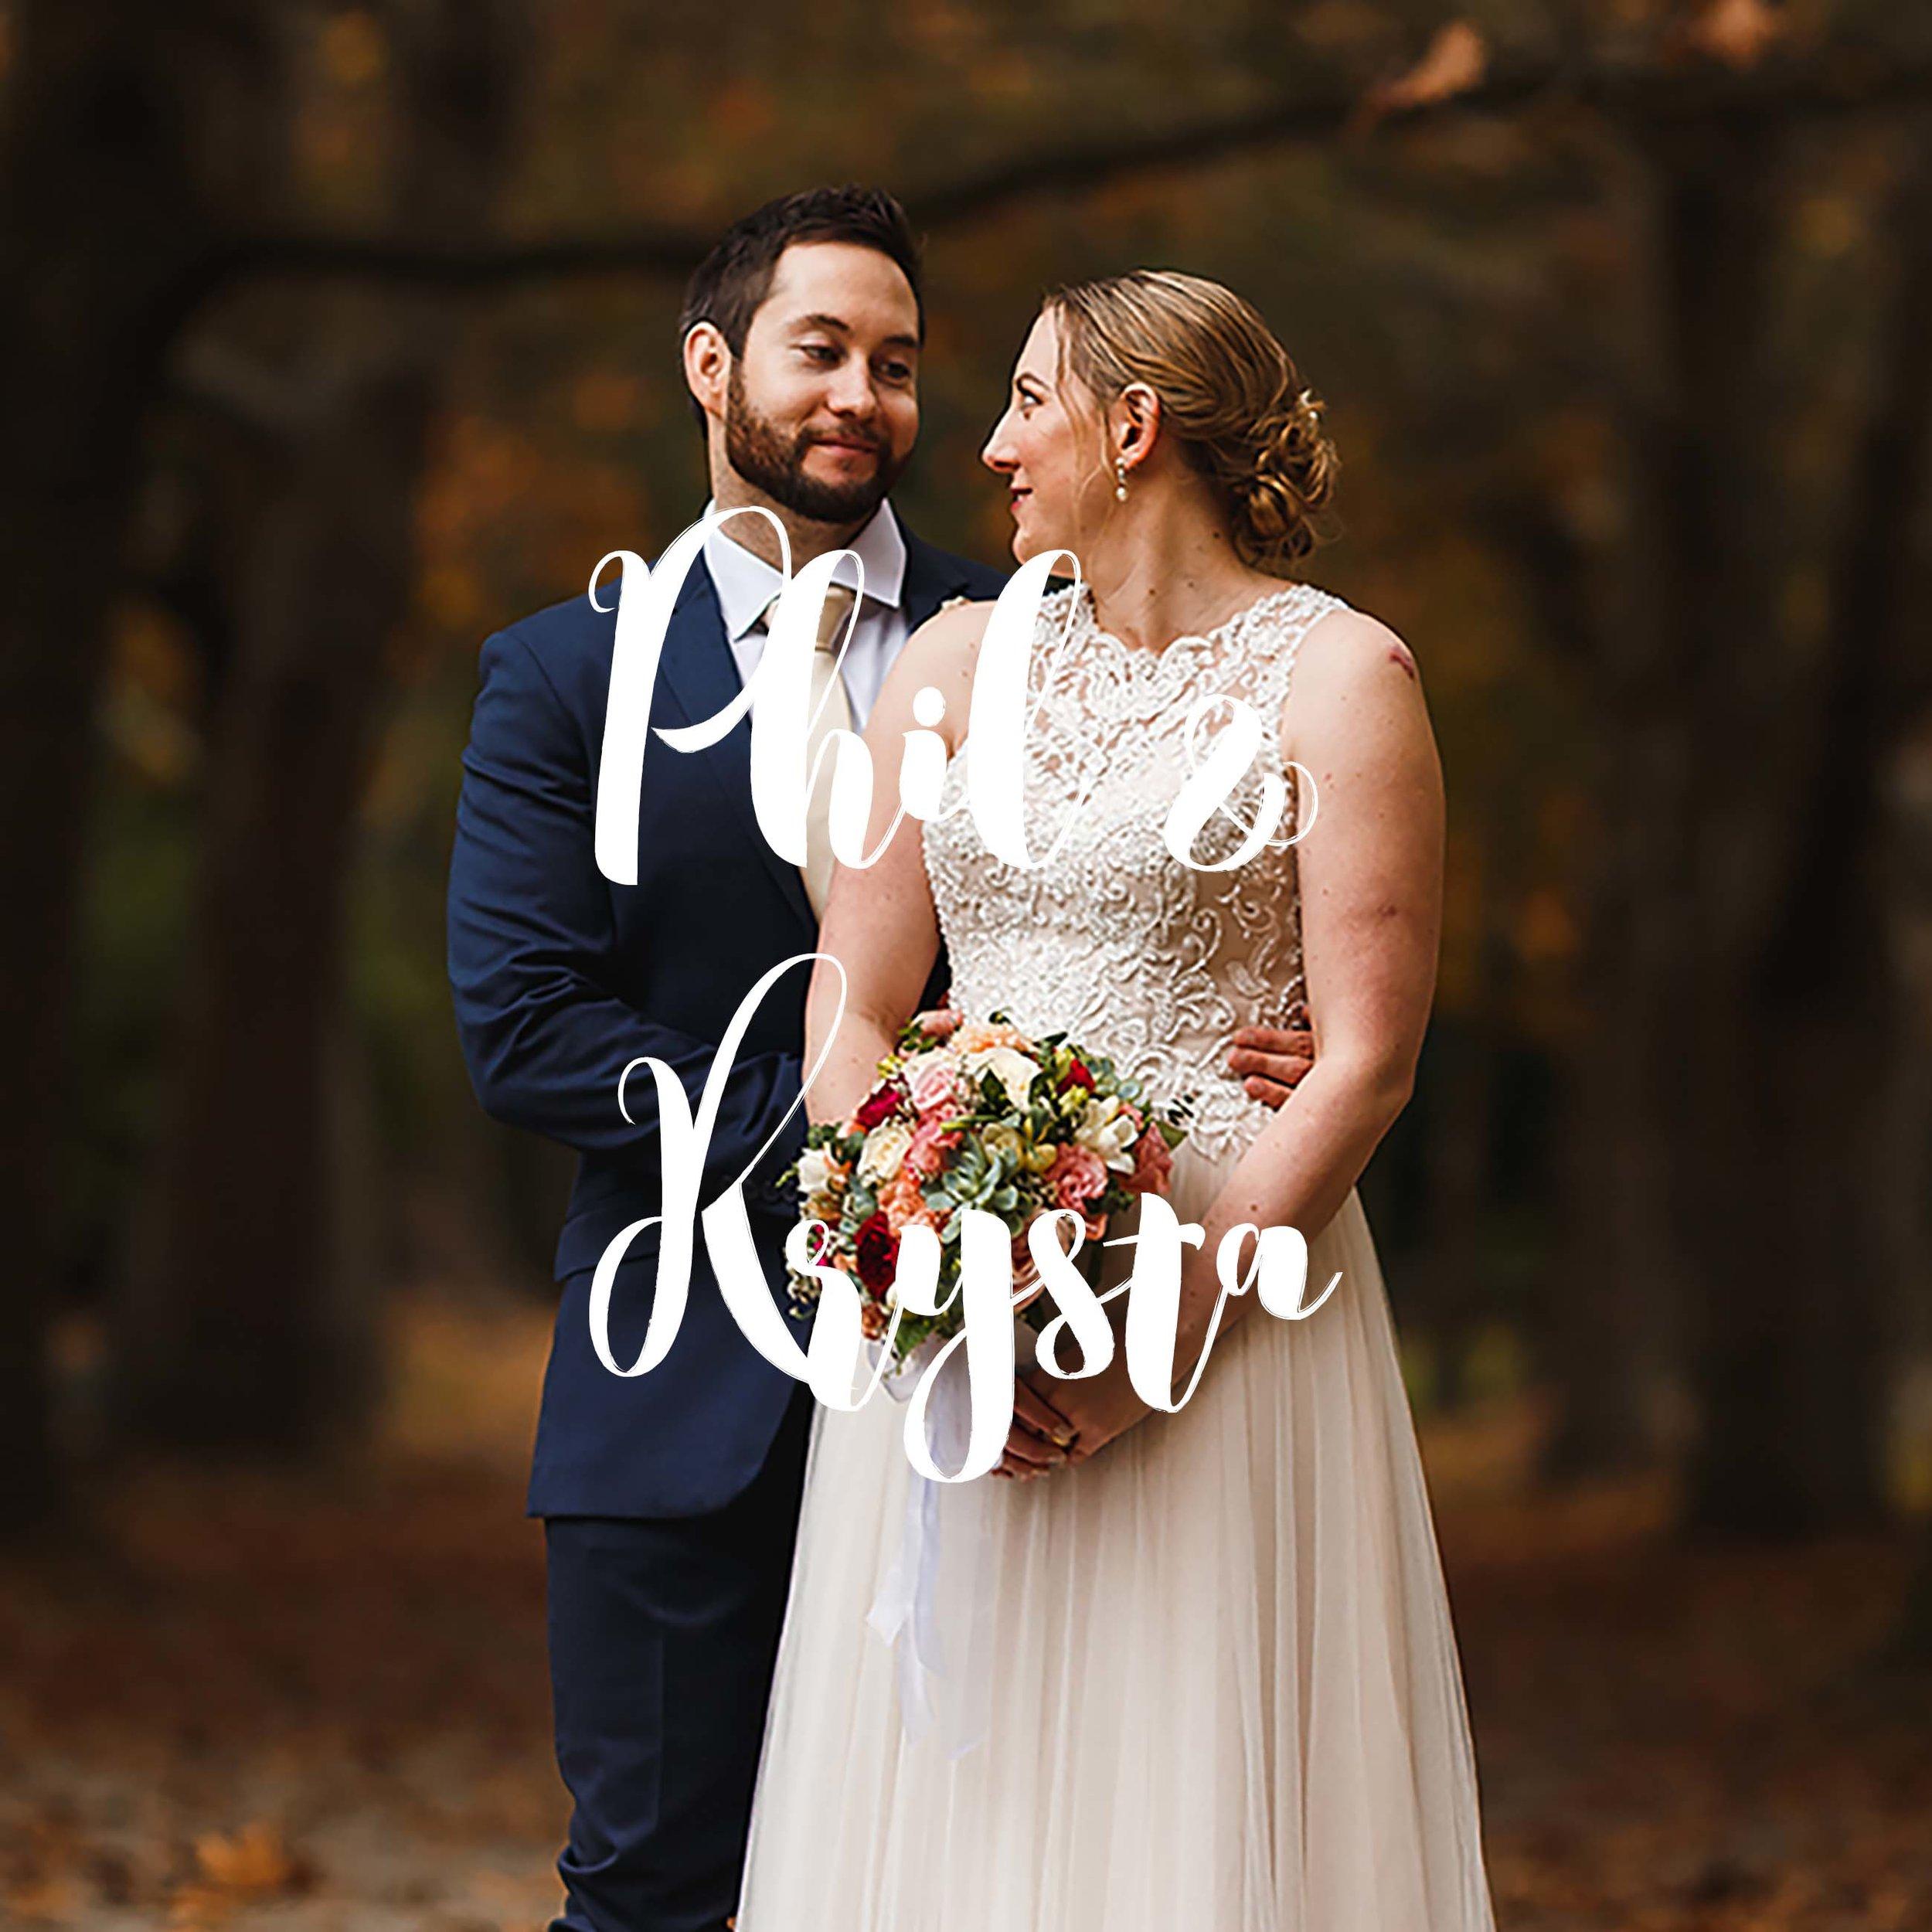 phil-krysta-wedding-photography.jpg